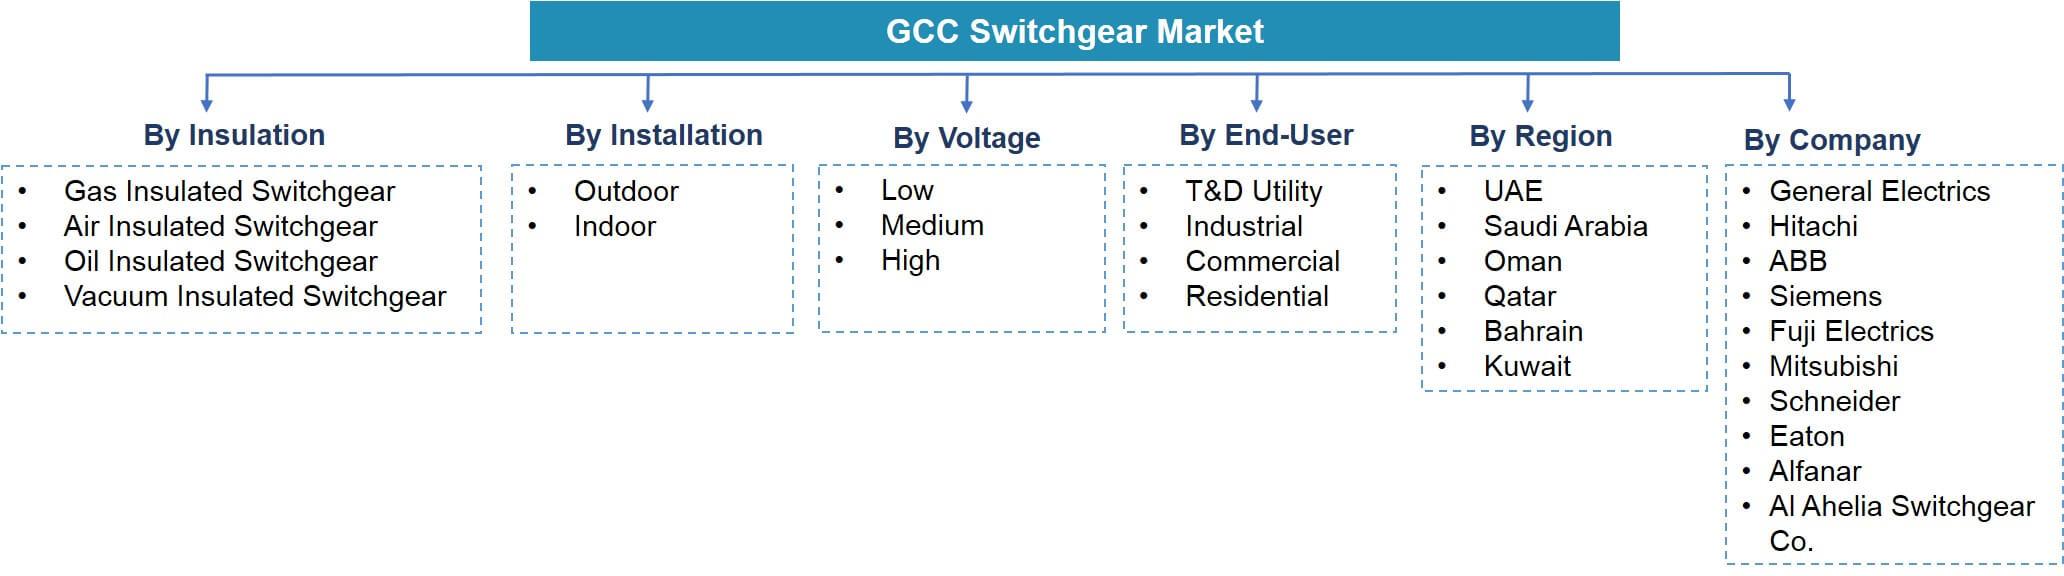 GCC Switchgear Market Segmentation